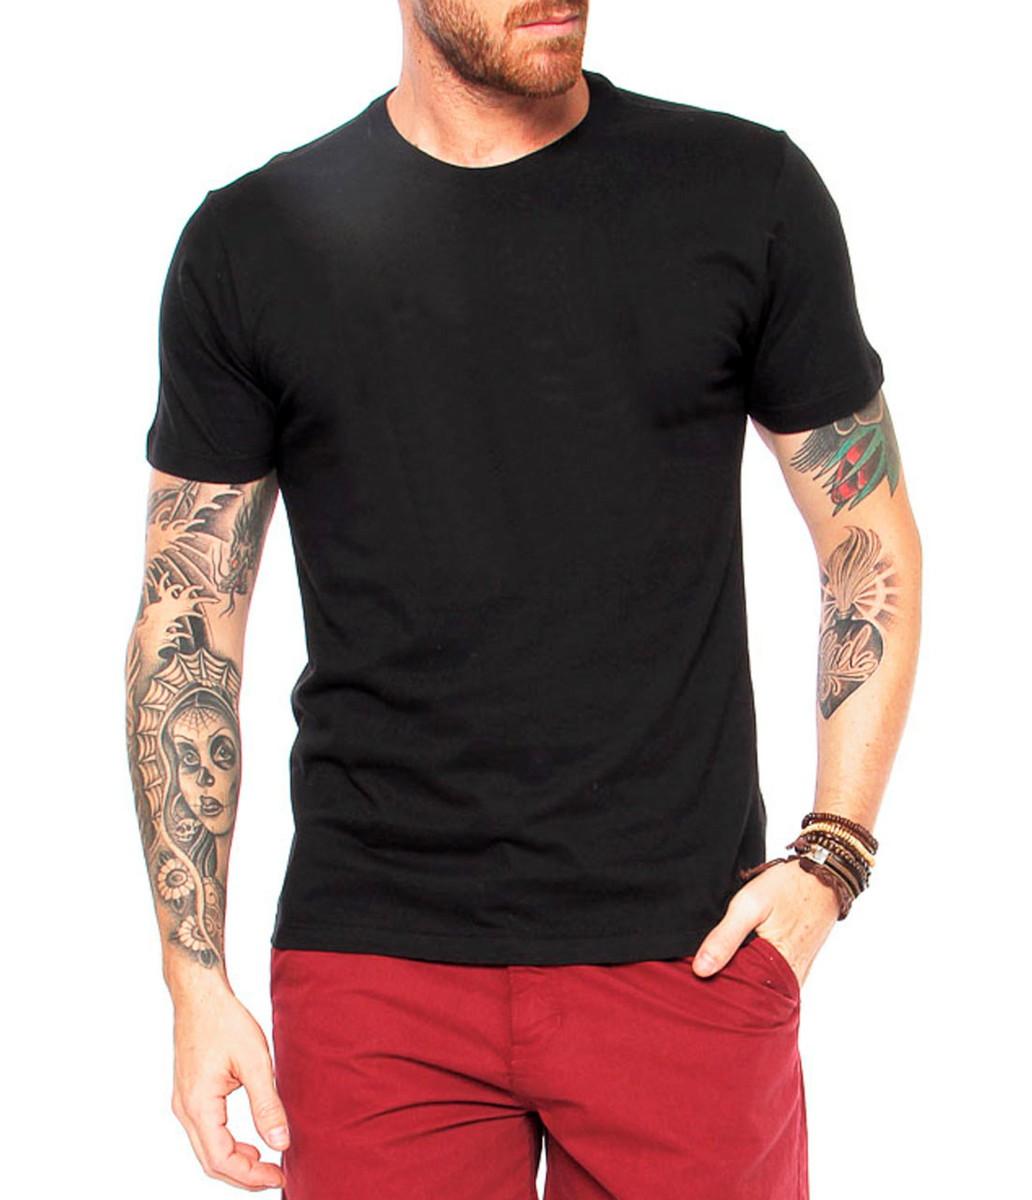 0beb25d86 Camiseta Masculina Lisa Básica Camisa Blusa Manga Curta no Elo7 ...